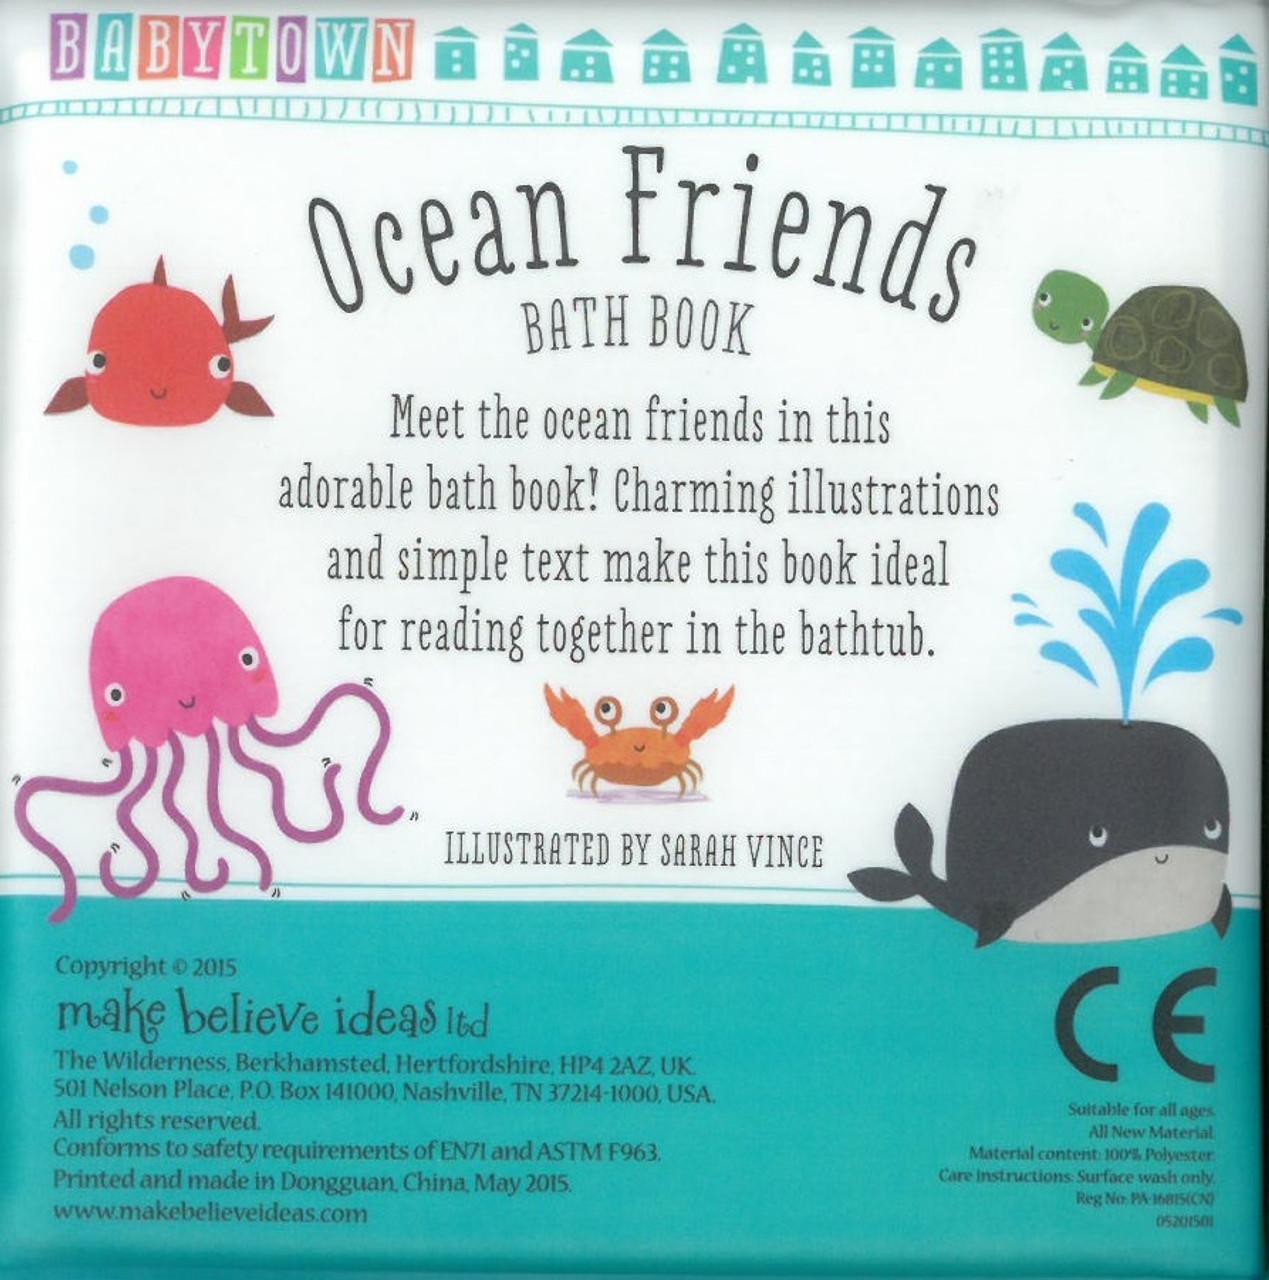 Ocean Friends: Babytown (Bath Book) - Books By The Bushel, LLC.